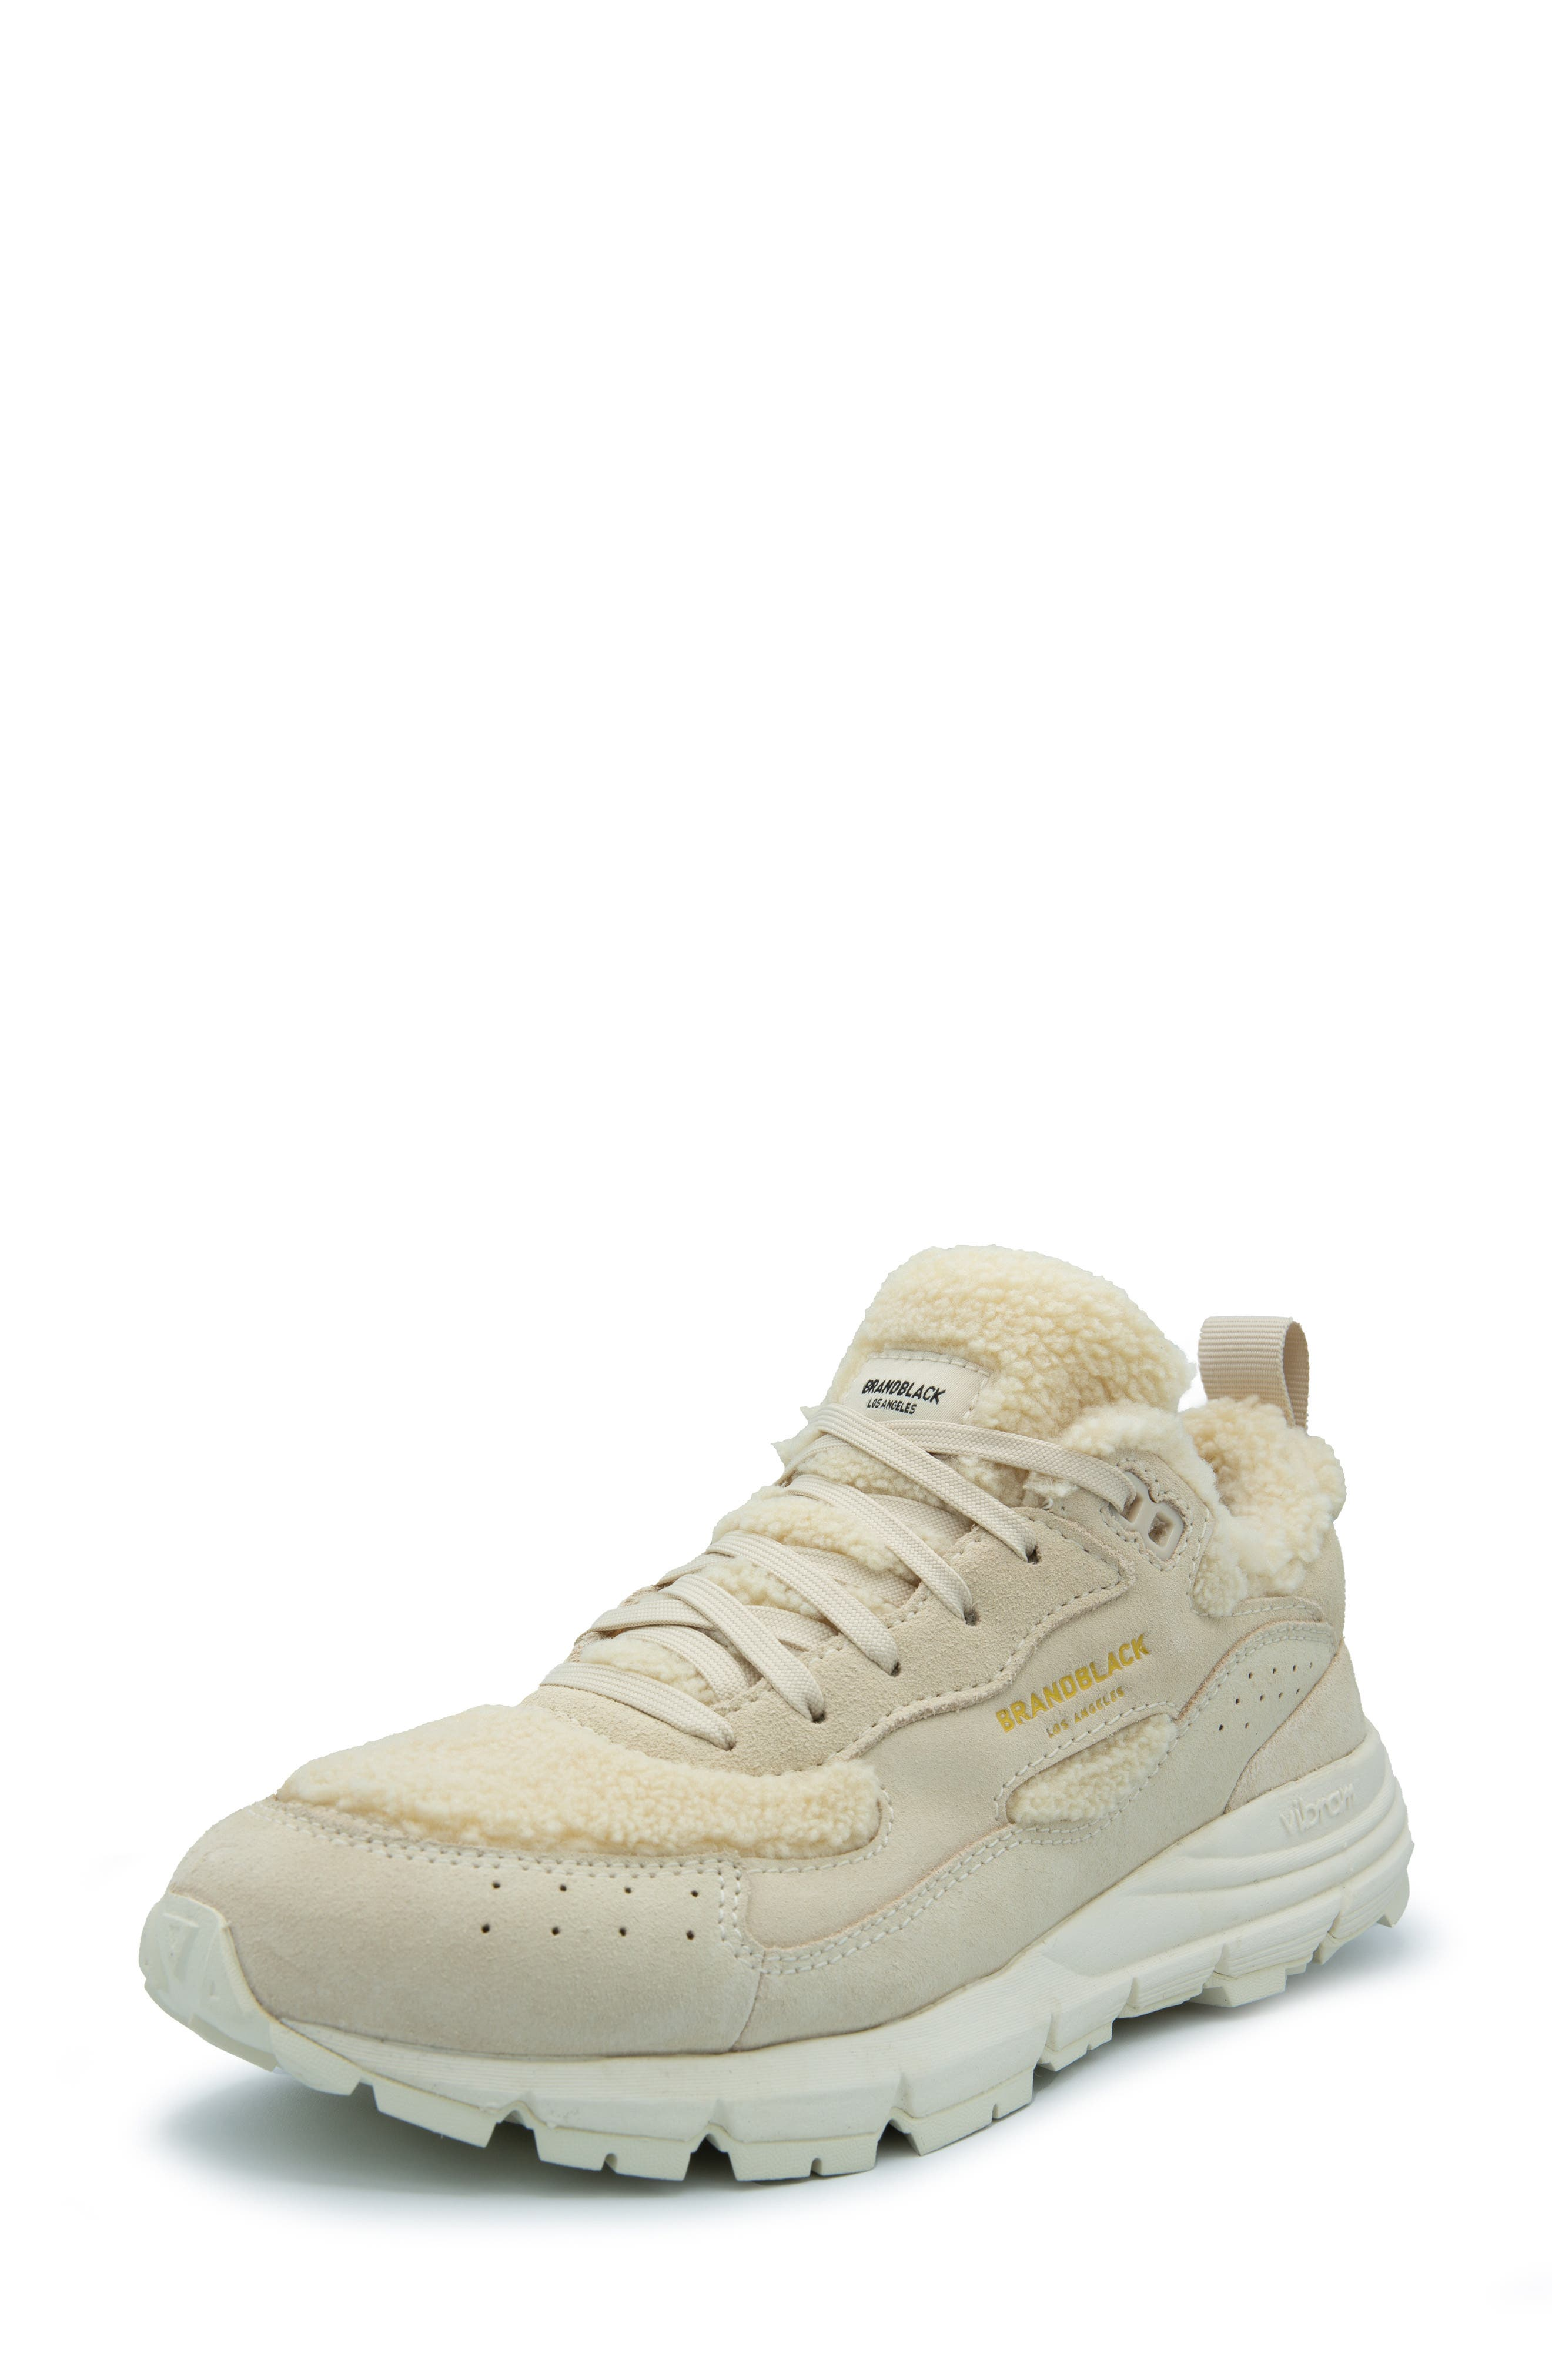 Nomo 2.0 Faux Shearling Sneaker